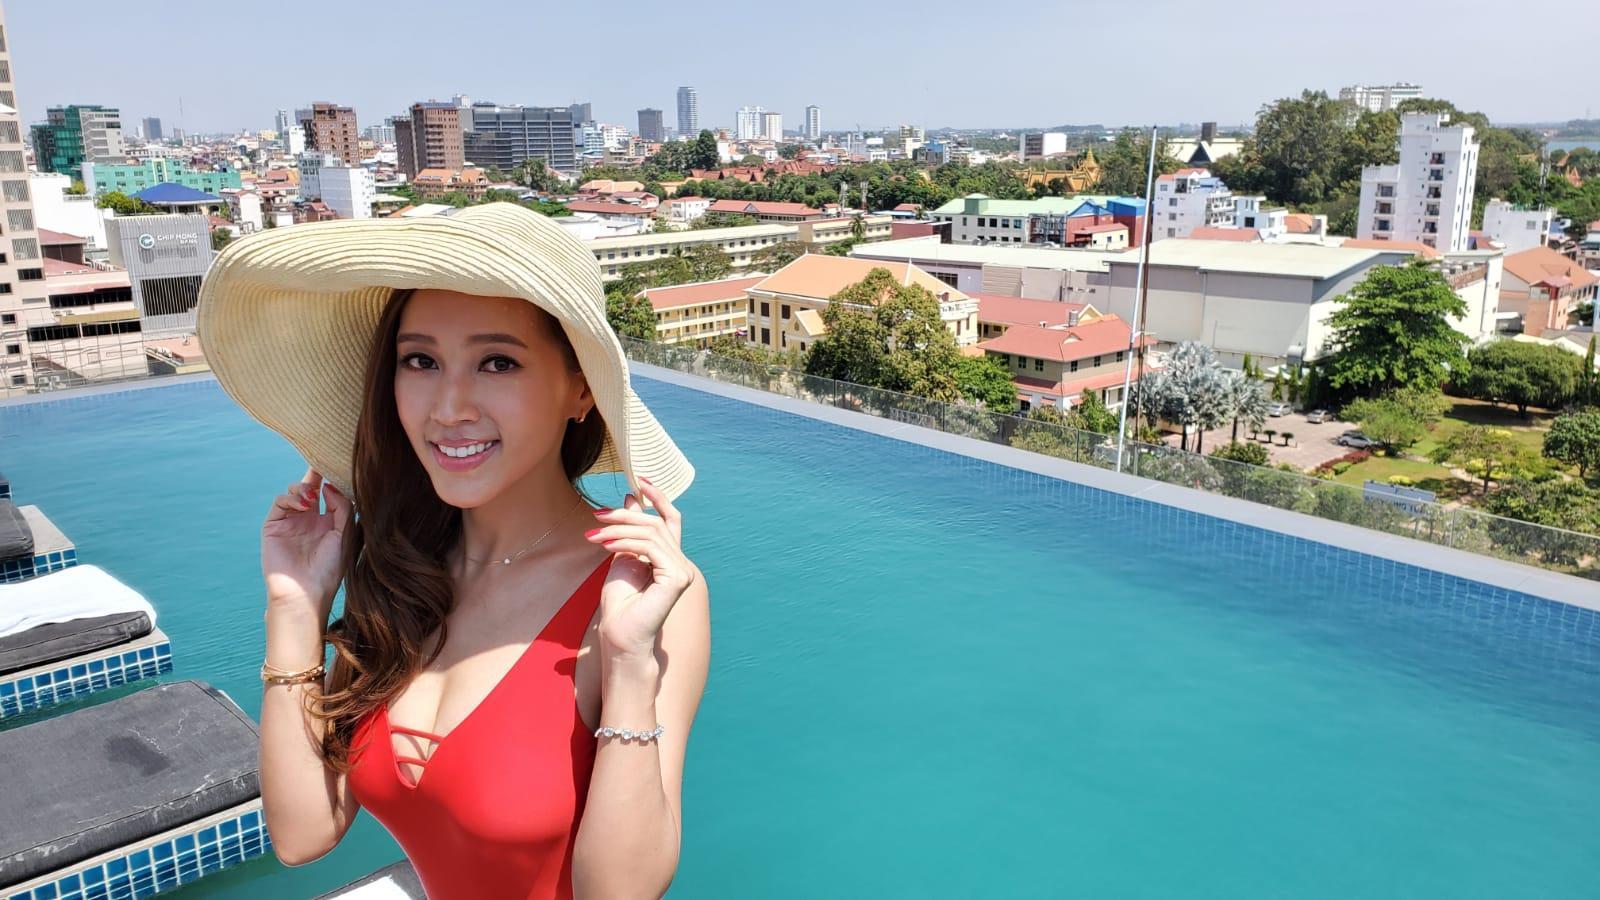 Hot爆泳池 Kelly話當地天氣雖然熱,但有微風送爽,變得好舒適呀!